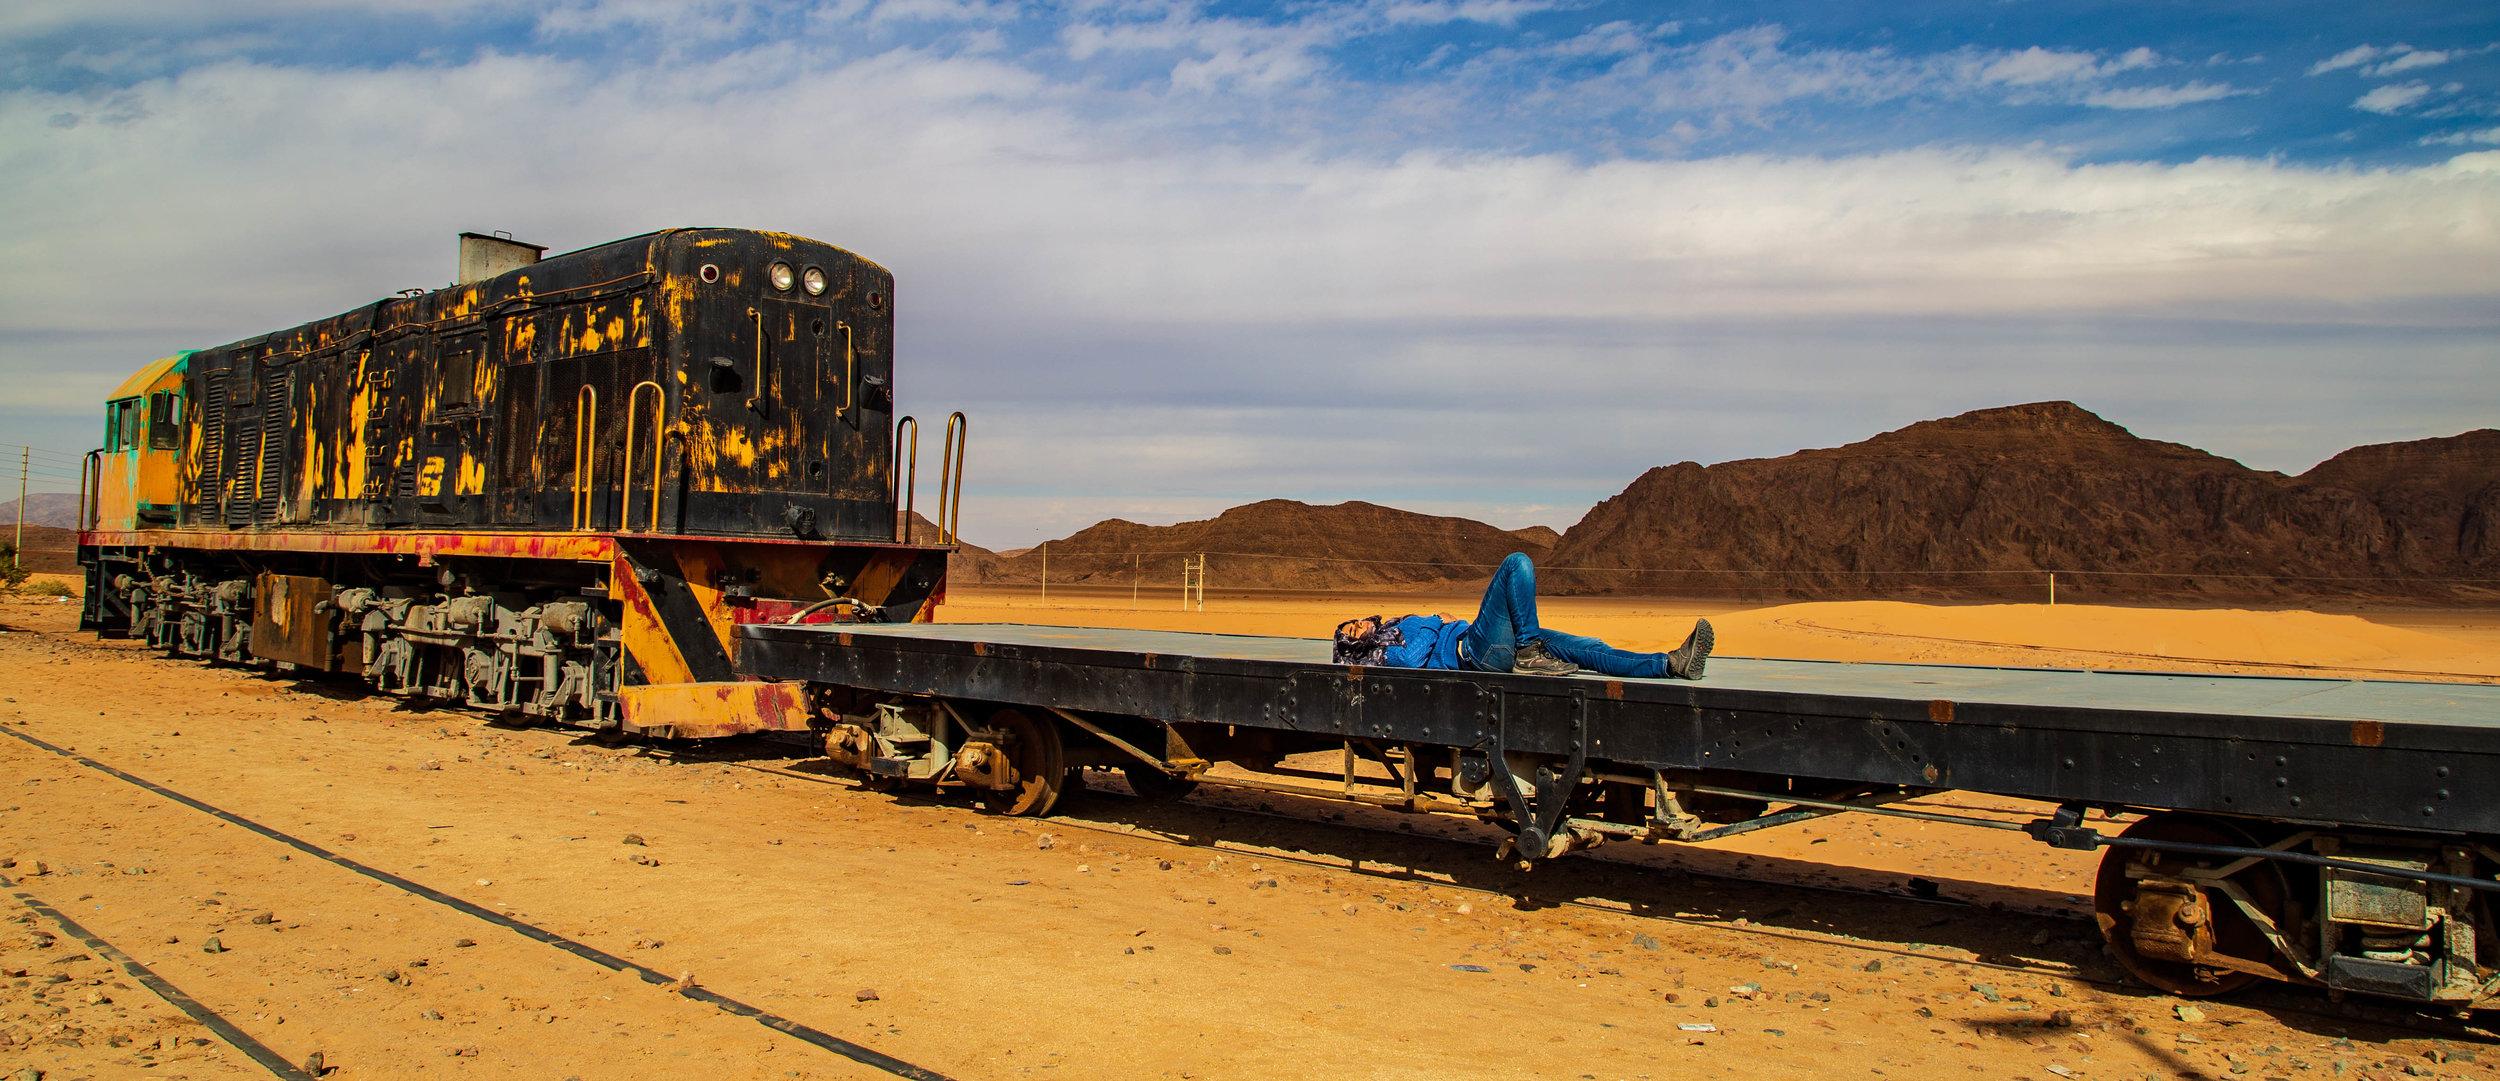 Train station in Wadi Rum